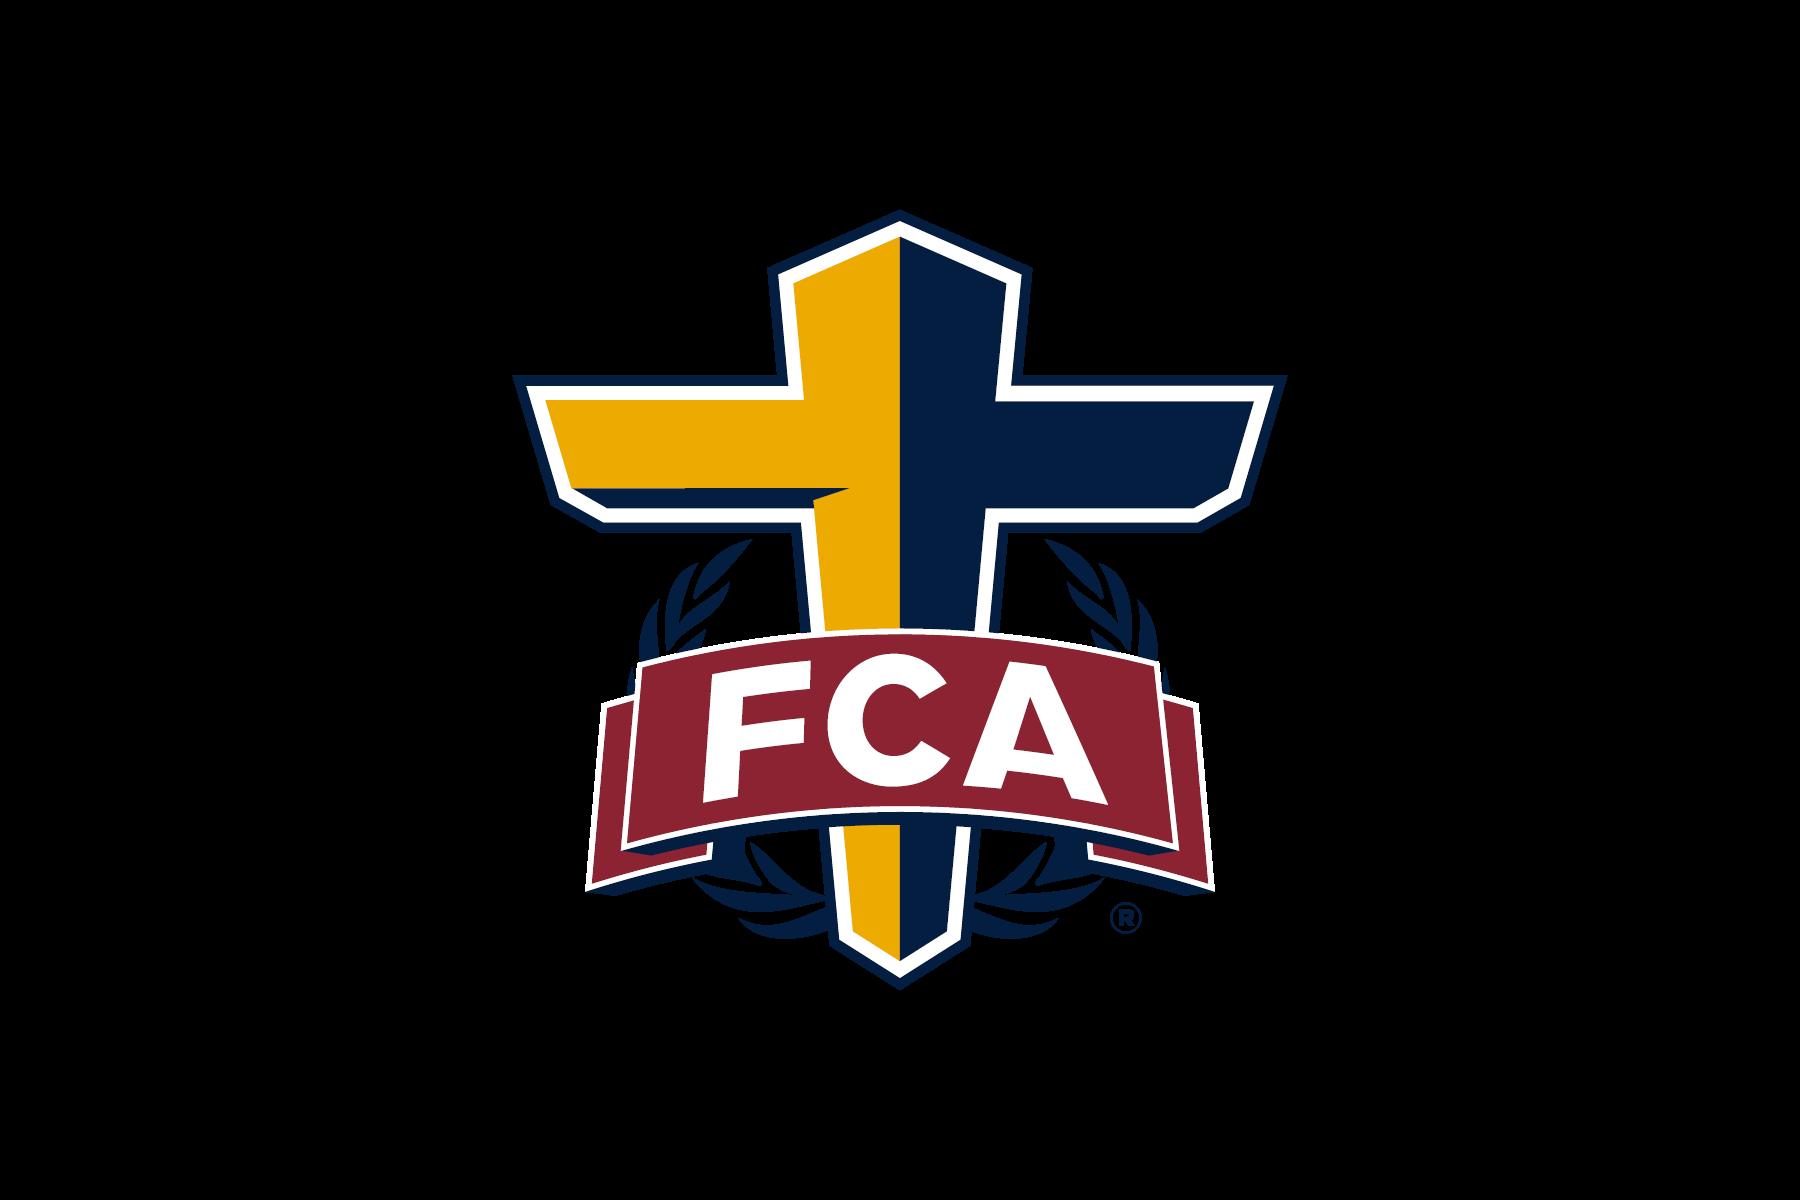 fca_logo_.png